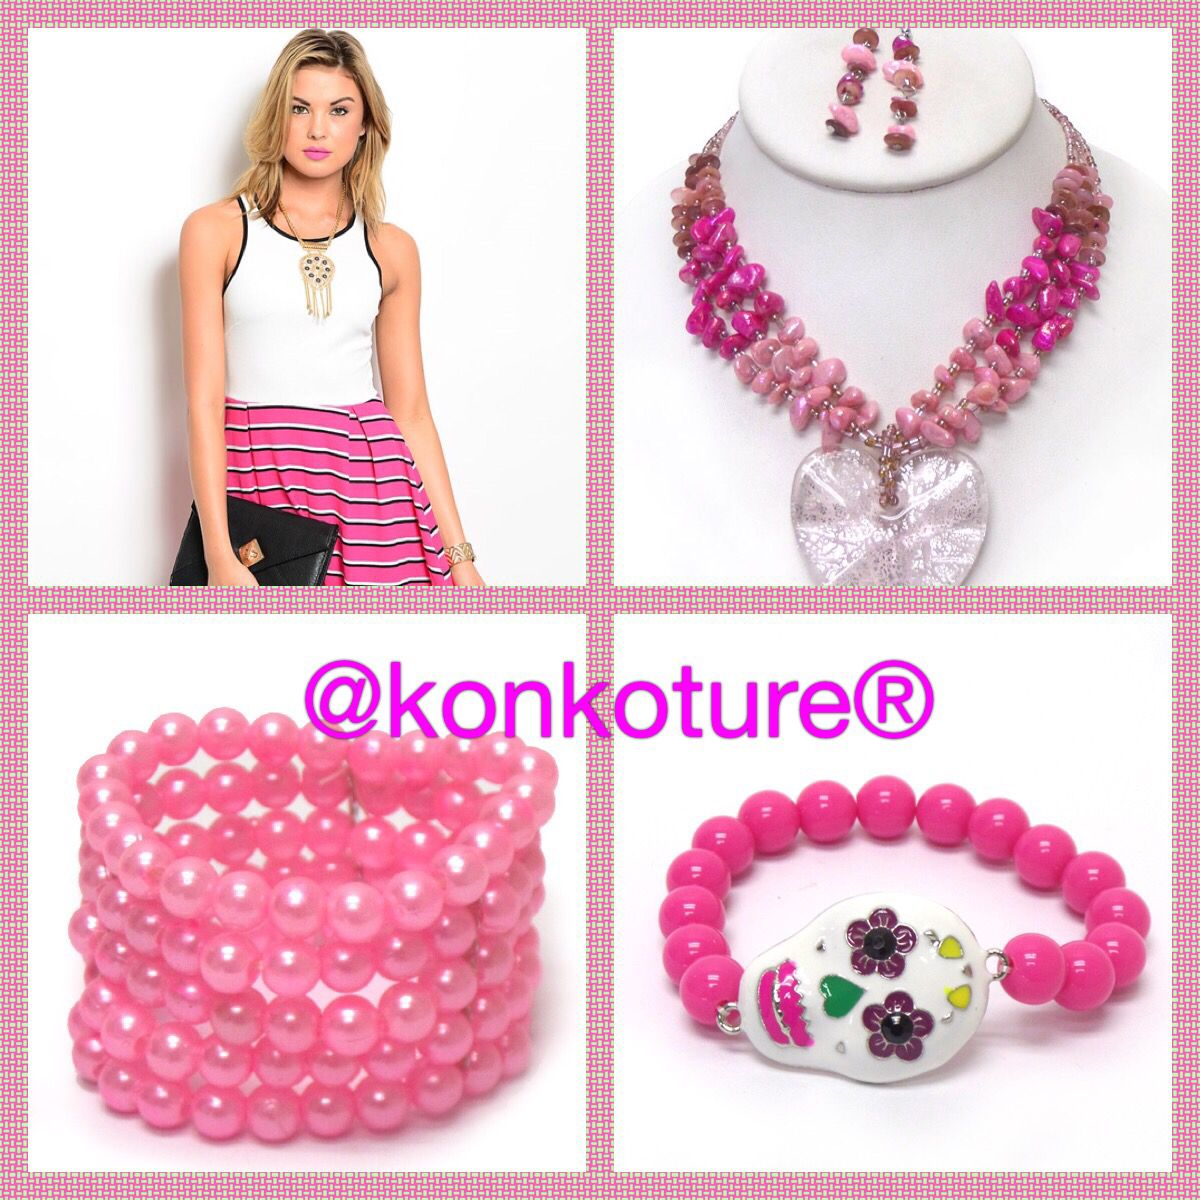 @konkoture on Instagram fashion for less boutique